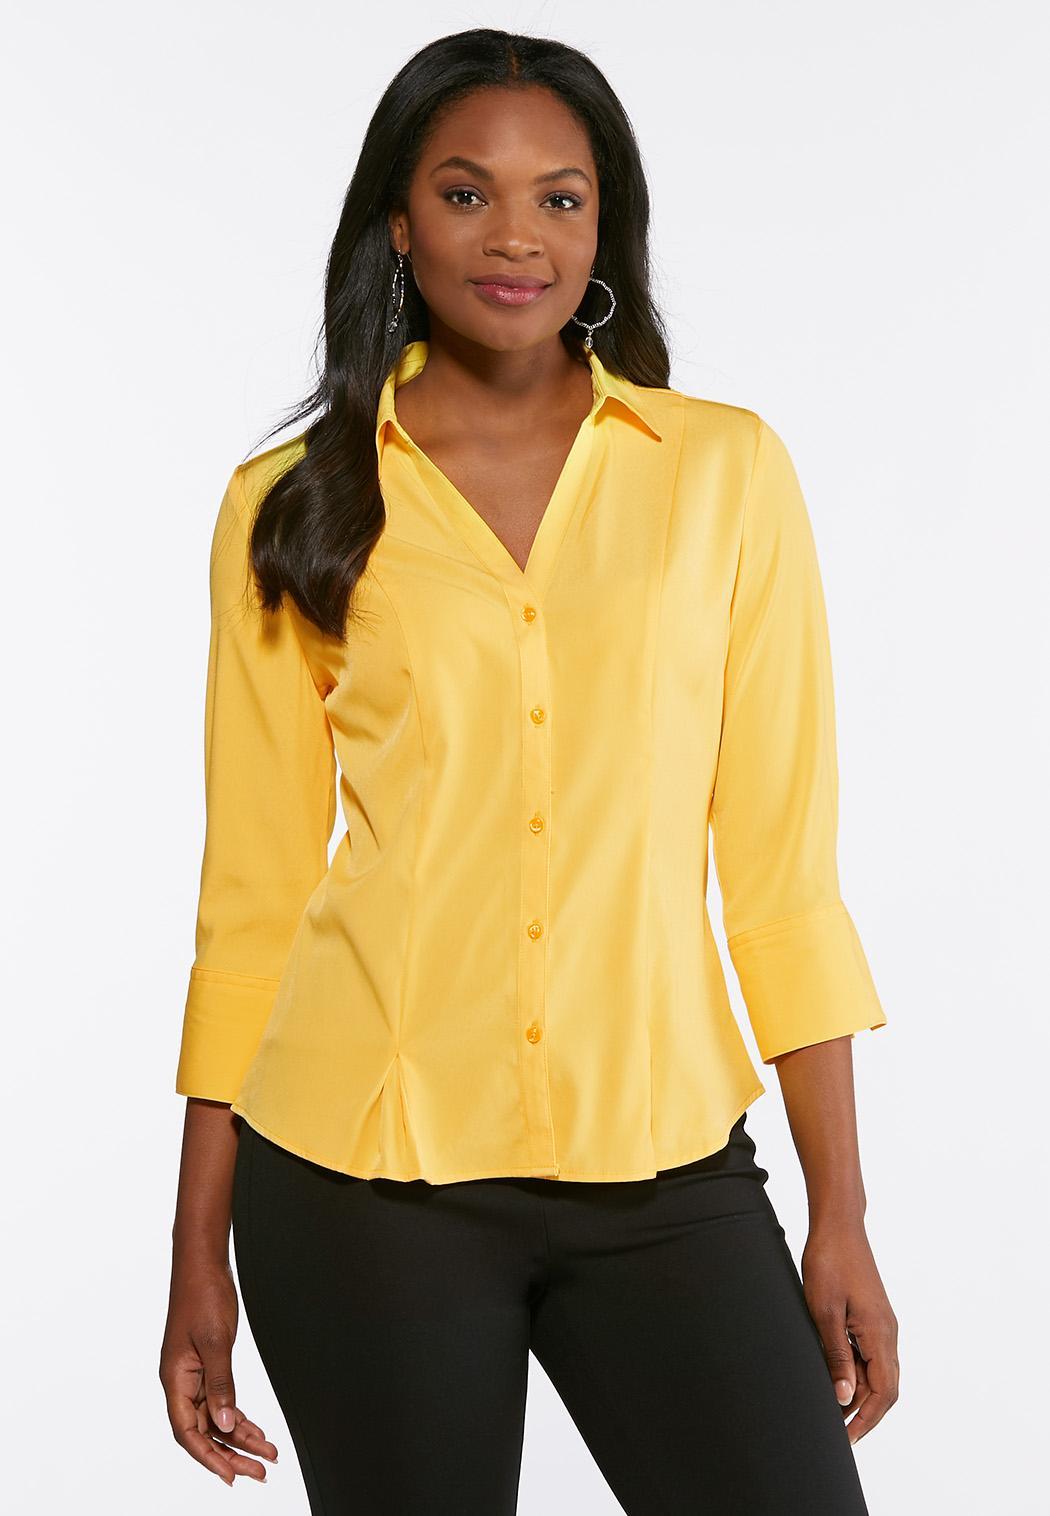 b00c07a819fd7 Pleated Hem Button Down Shirt Shirts   Blouses Cato Fashions